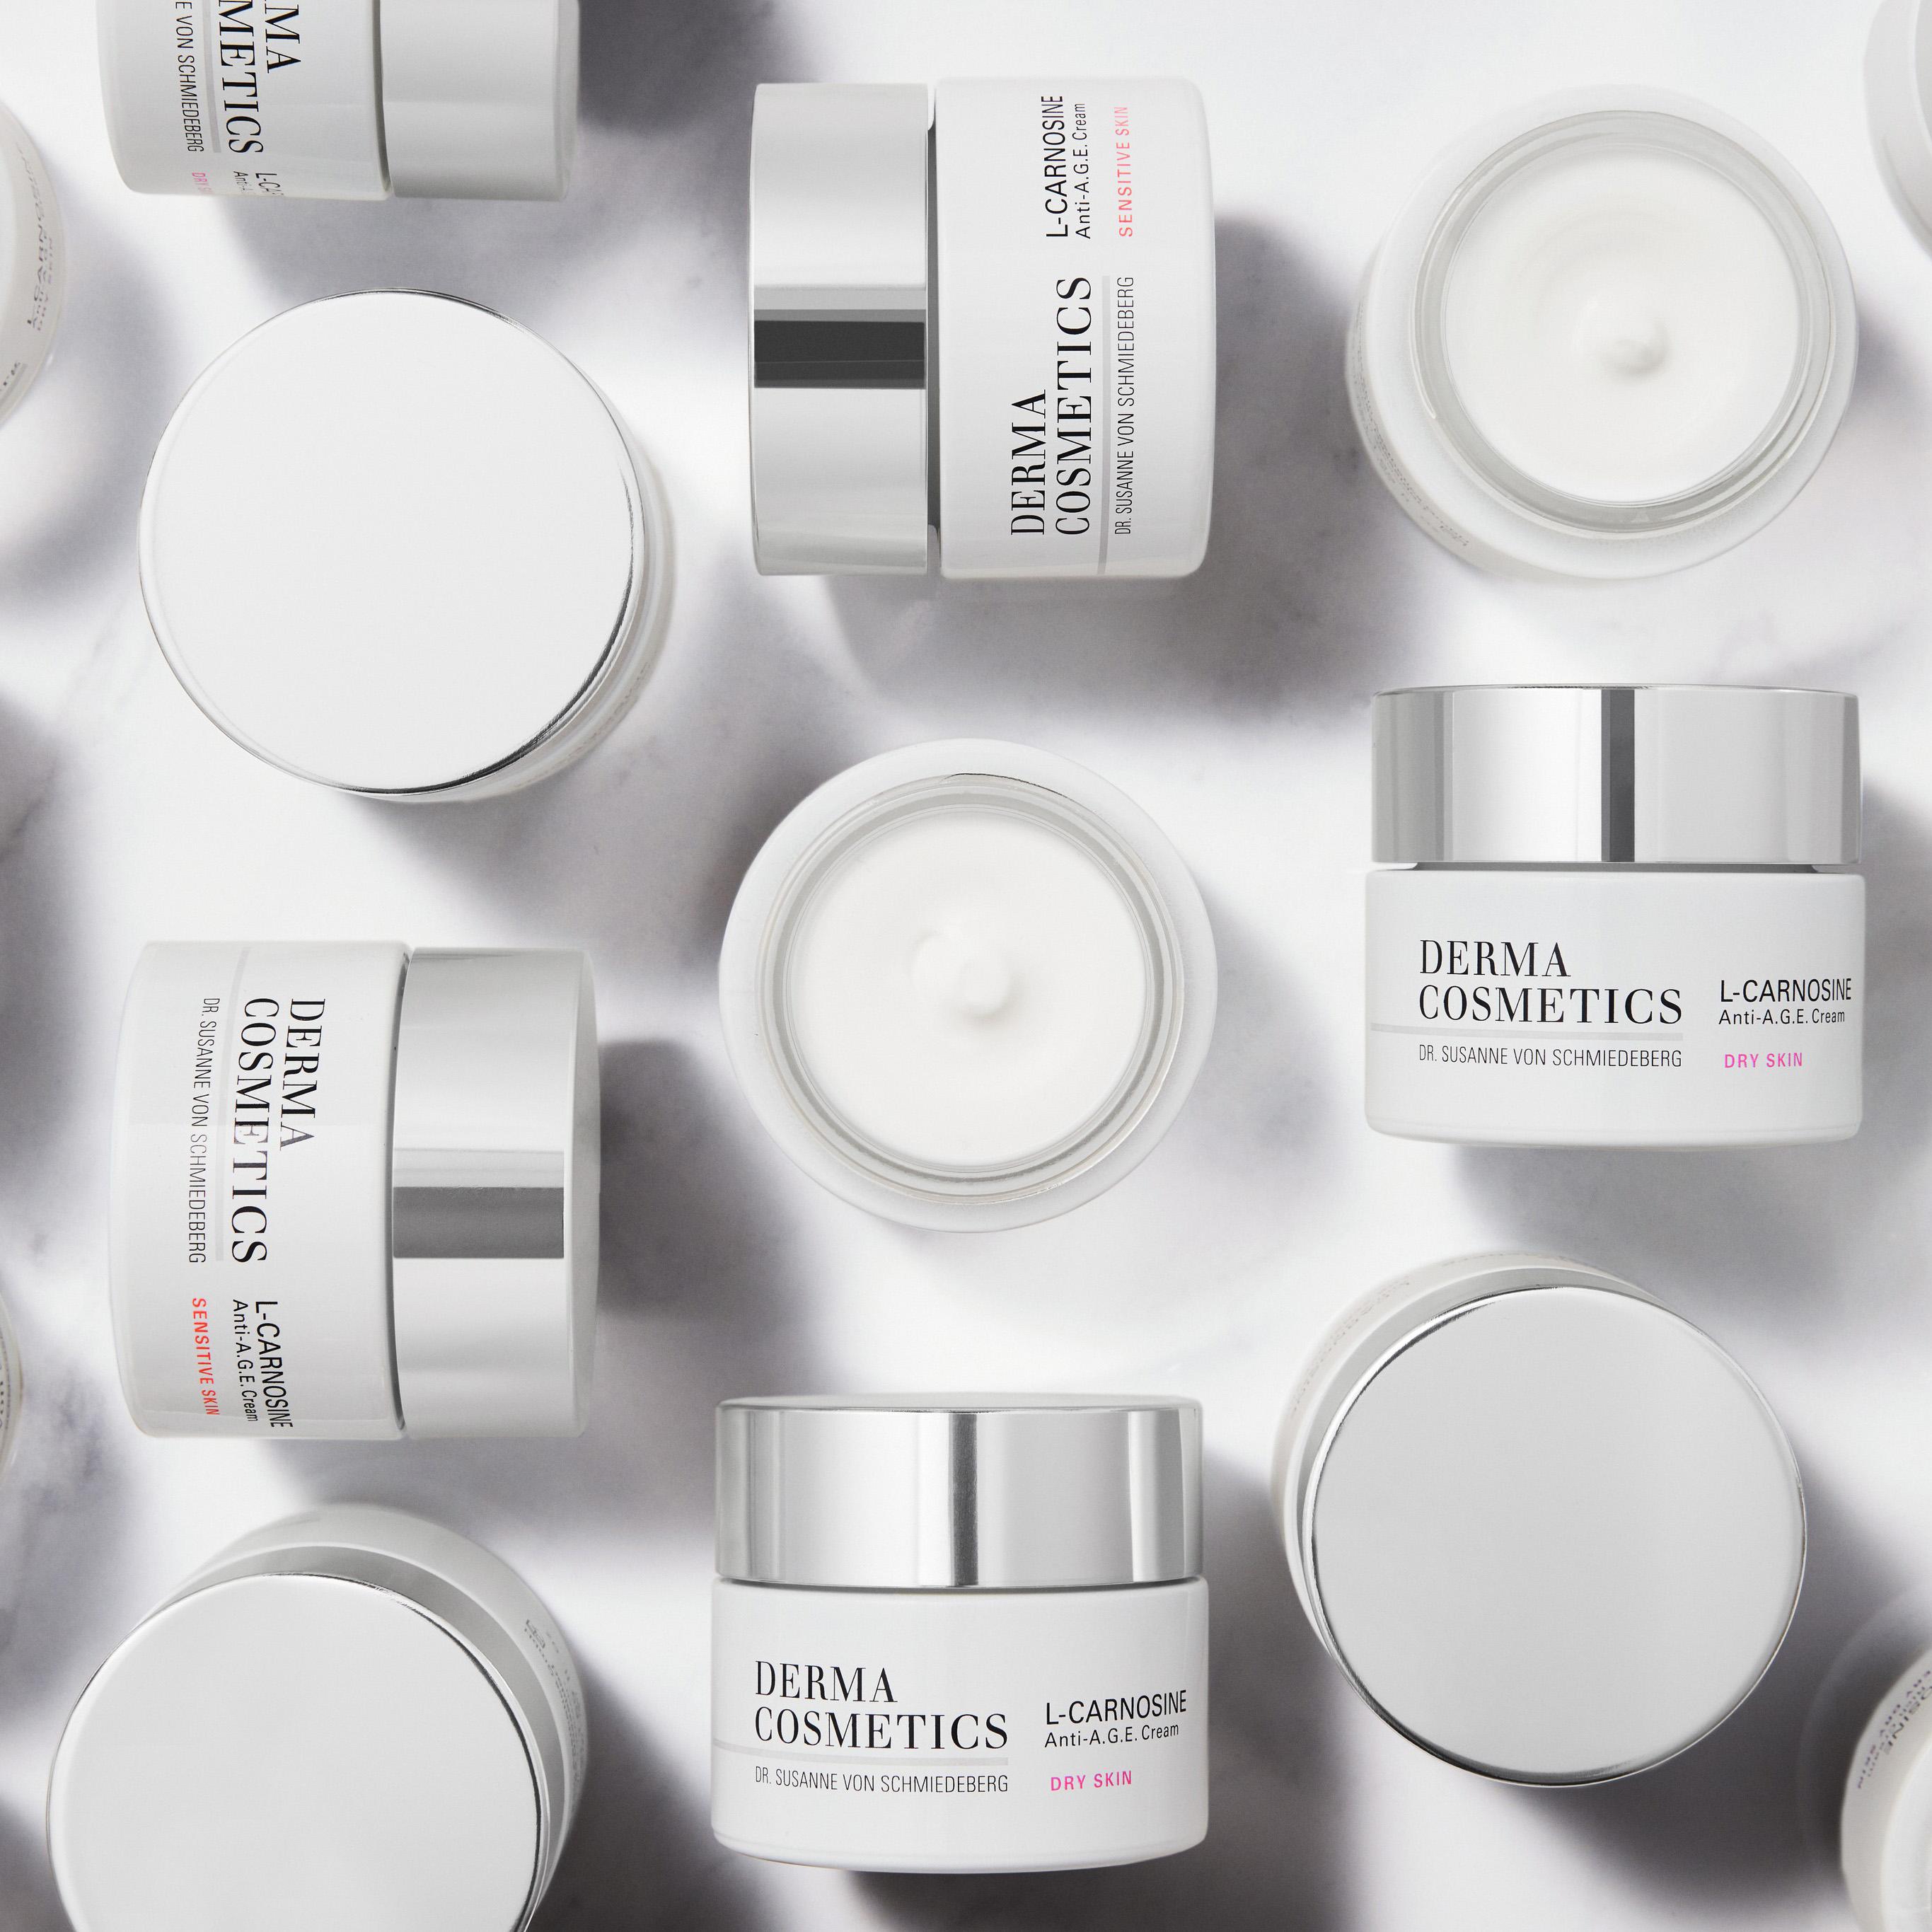 Skincare-product-dermacosmetics-all-creams-topshot-unlimited-Web-RenditionoRqUfWJc0PWNg